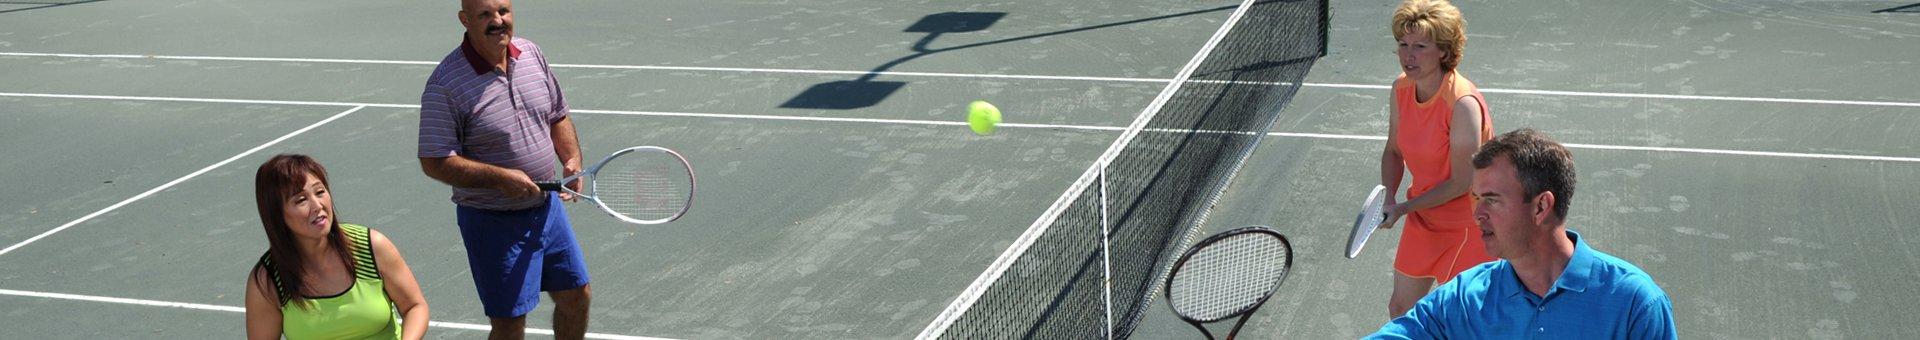 tennis court at mission inn resort